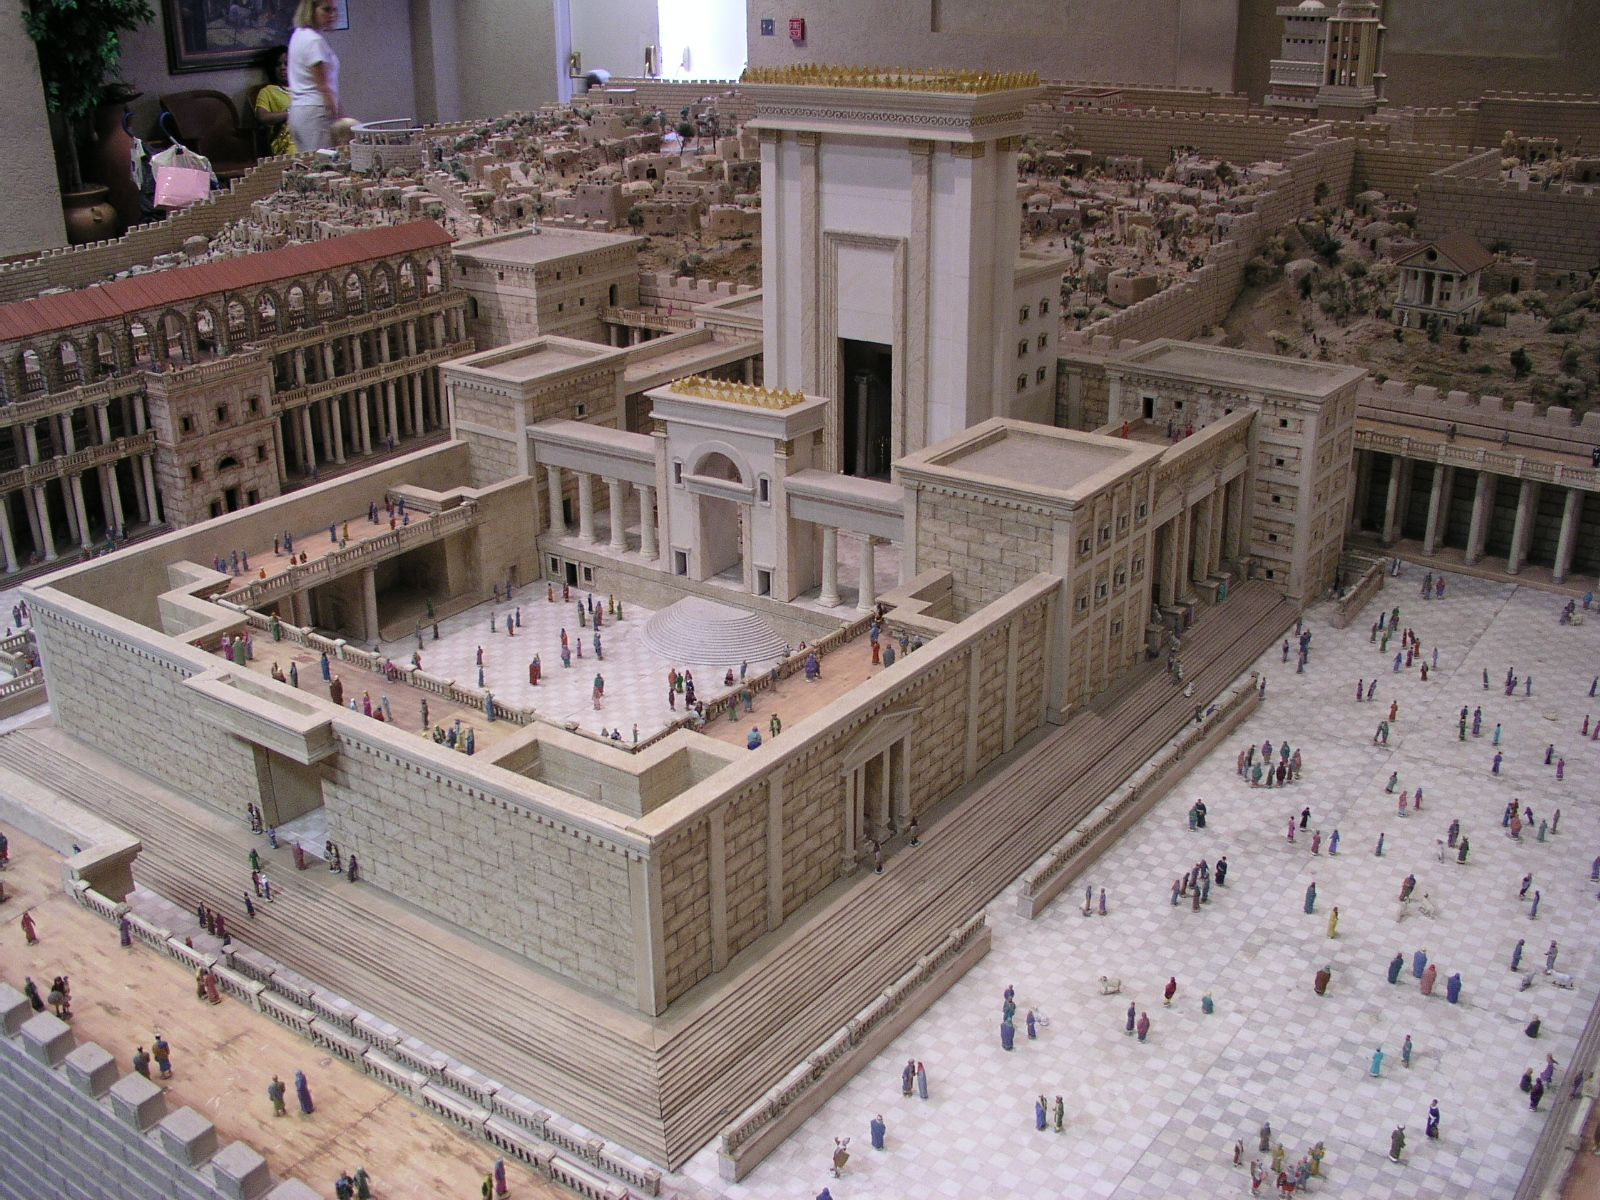 solomons temple israel pinterest temple solomons